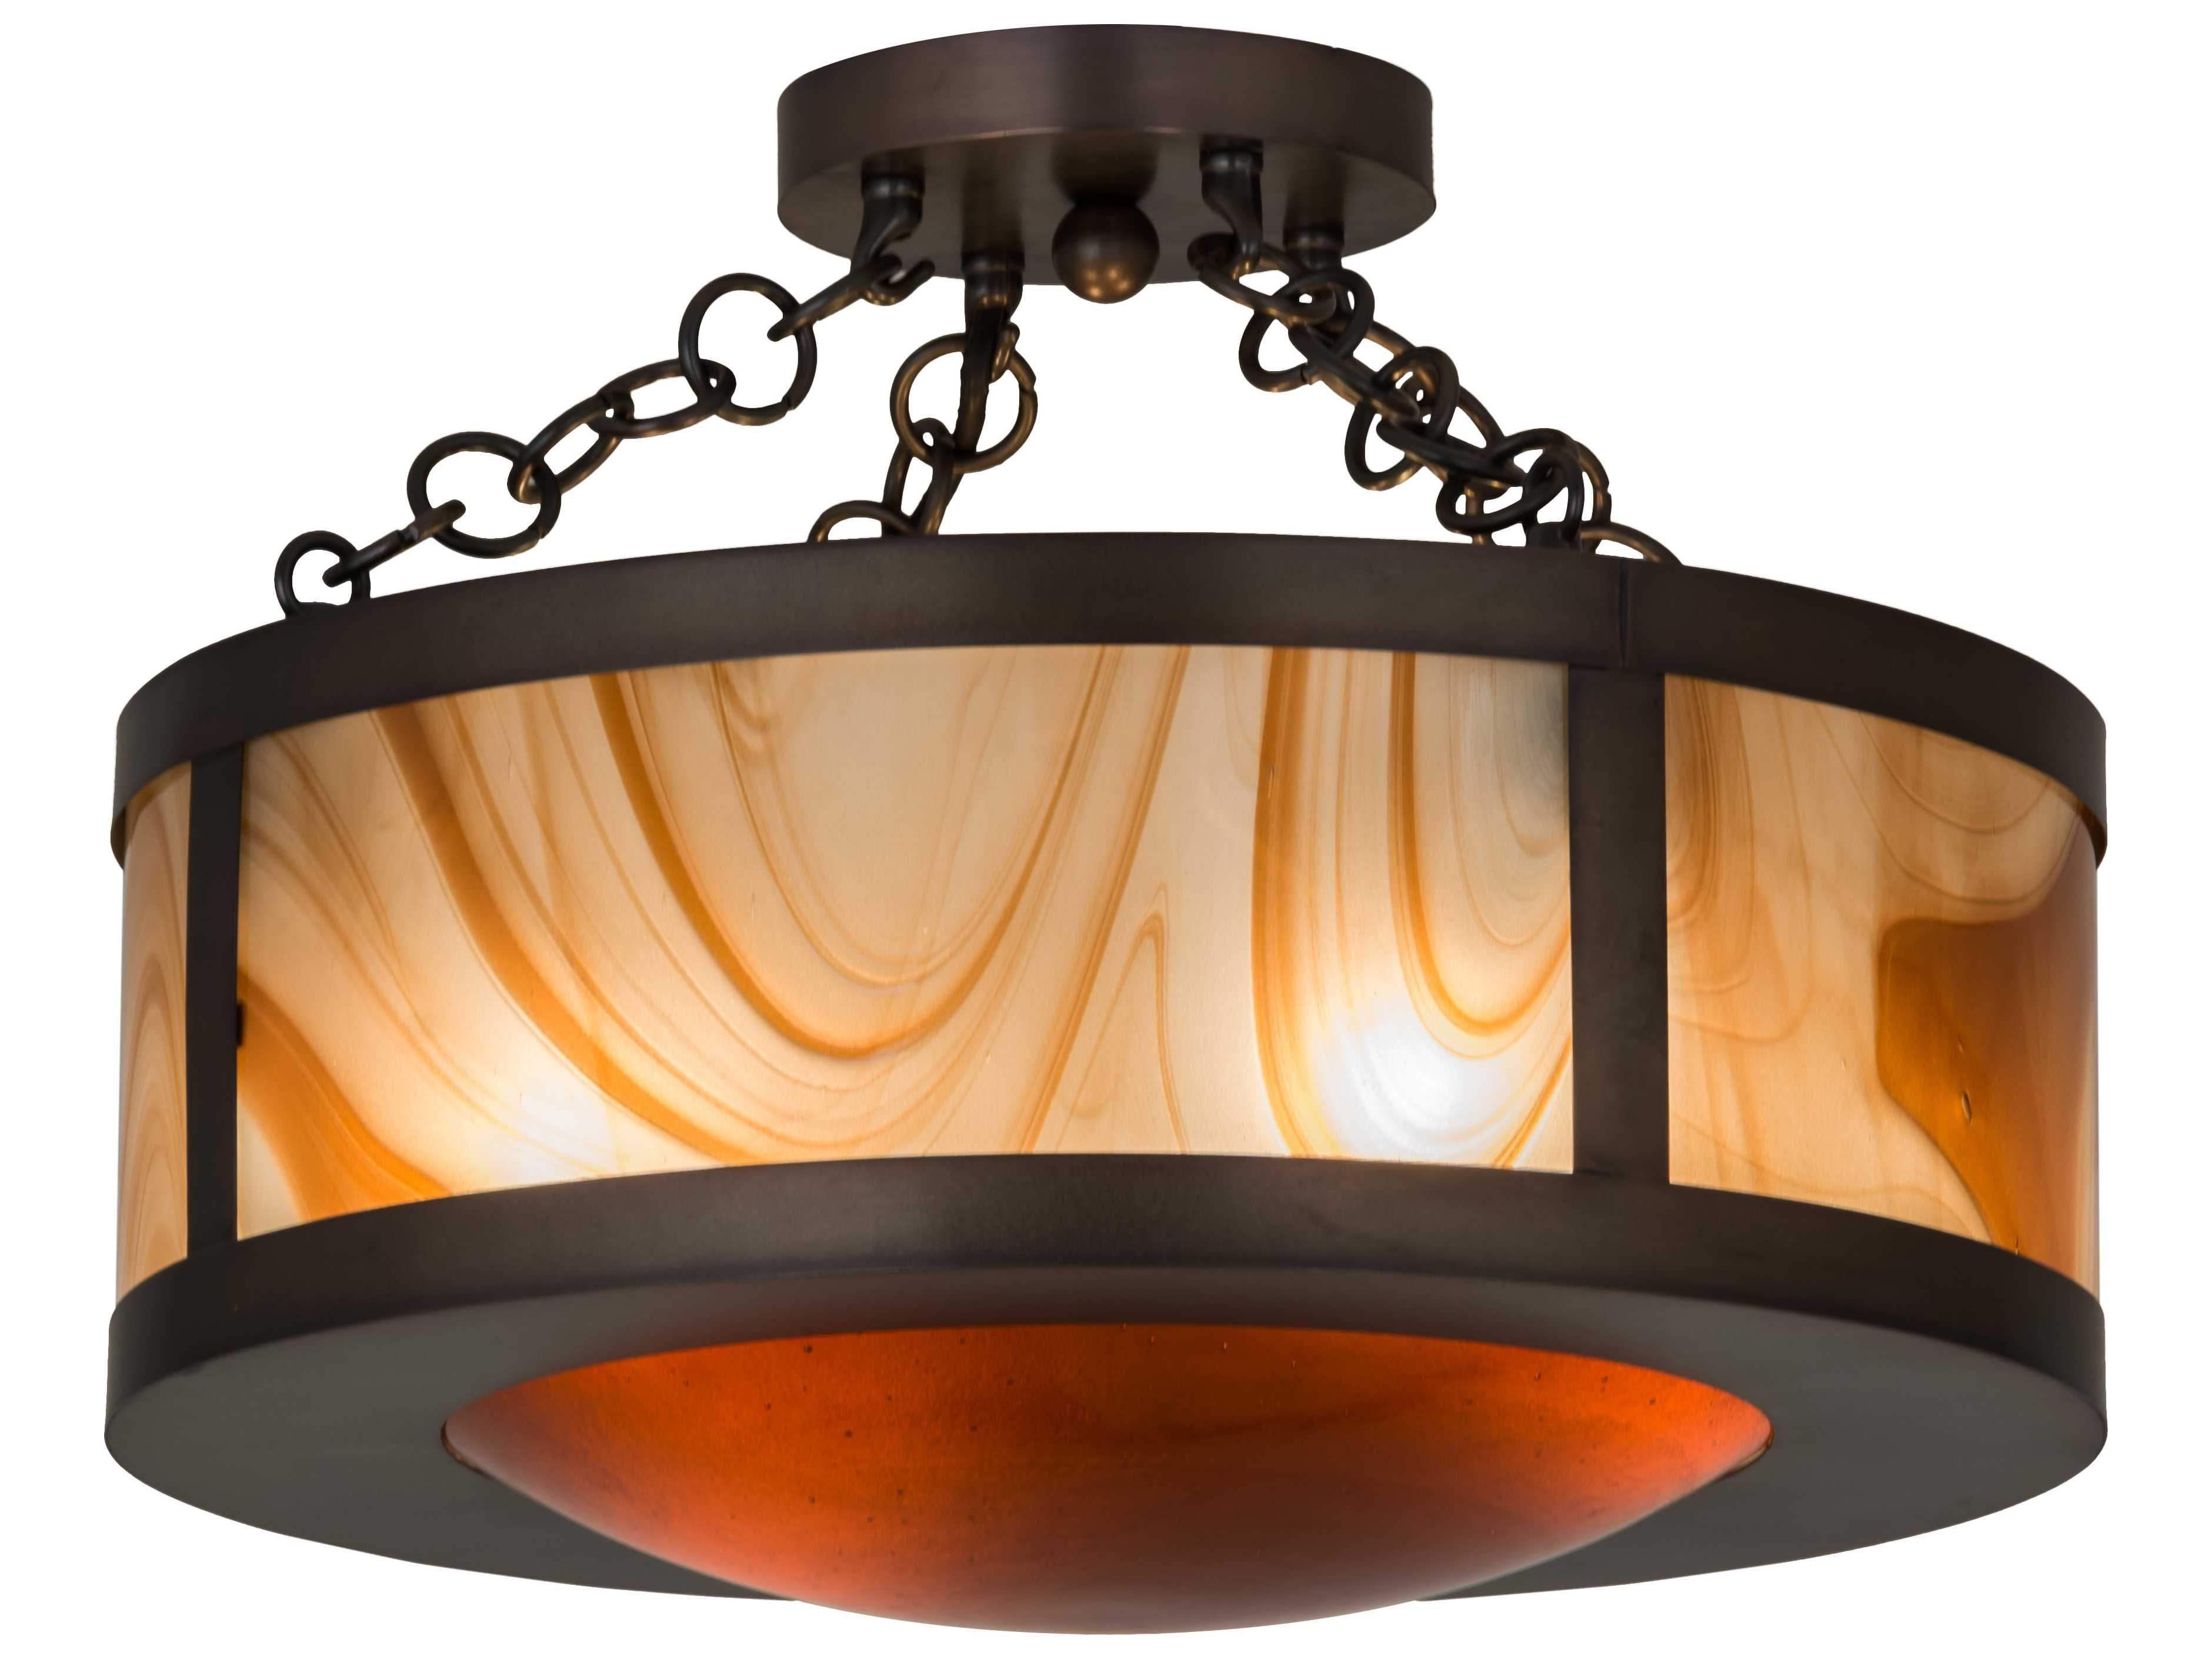 Meyda Lighting Tiffany Lamps Chandeliers Arts And Crafts Crafts Meyda